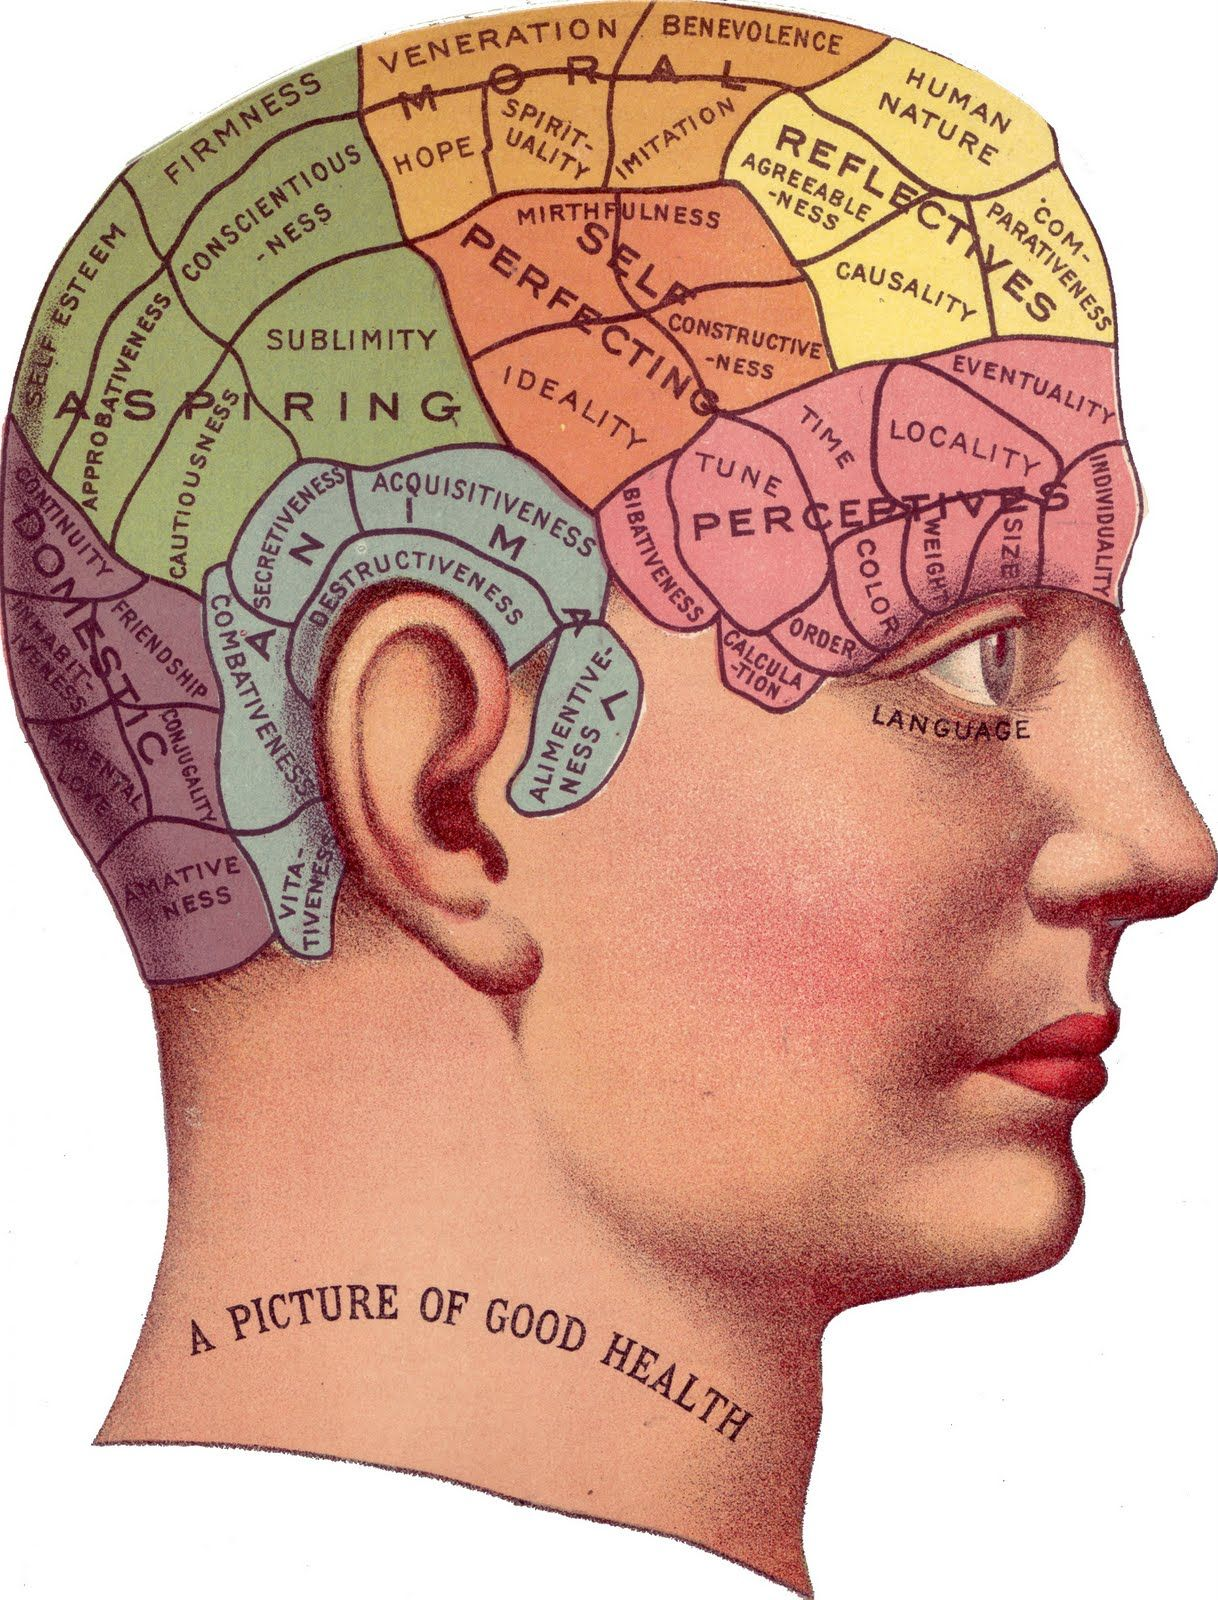 Vintage Clip Art Phrenology Head In Color The Graphics Fairy Clip Art Vintage Phrenology Phrenology Head